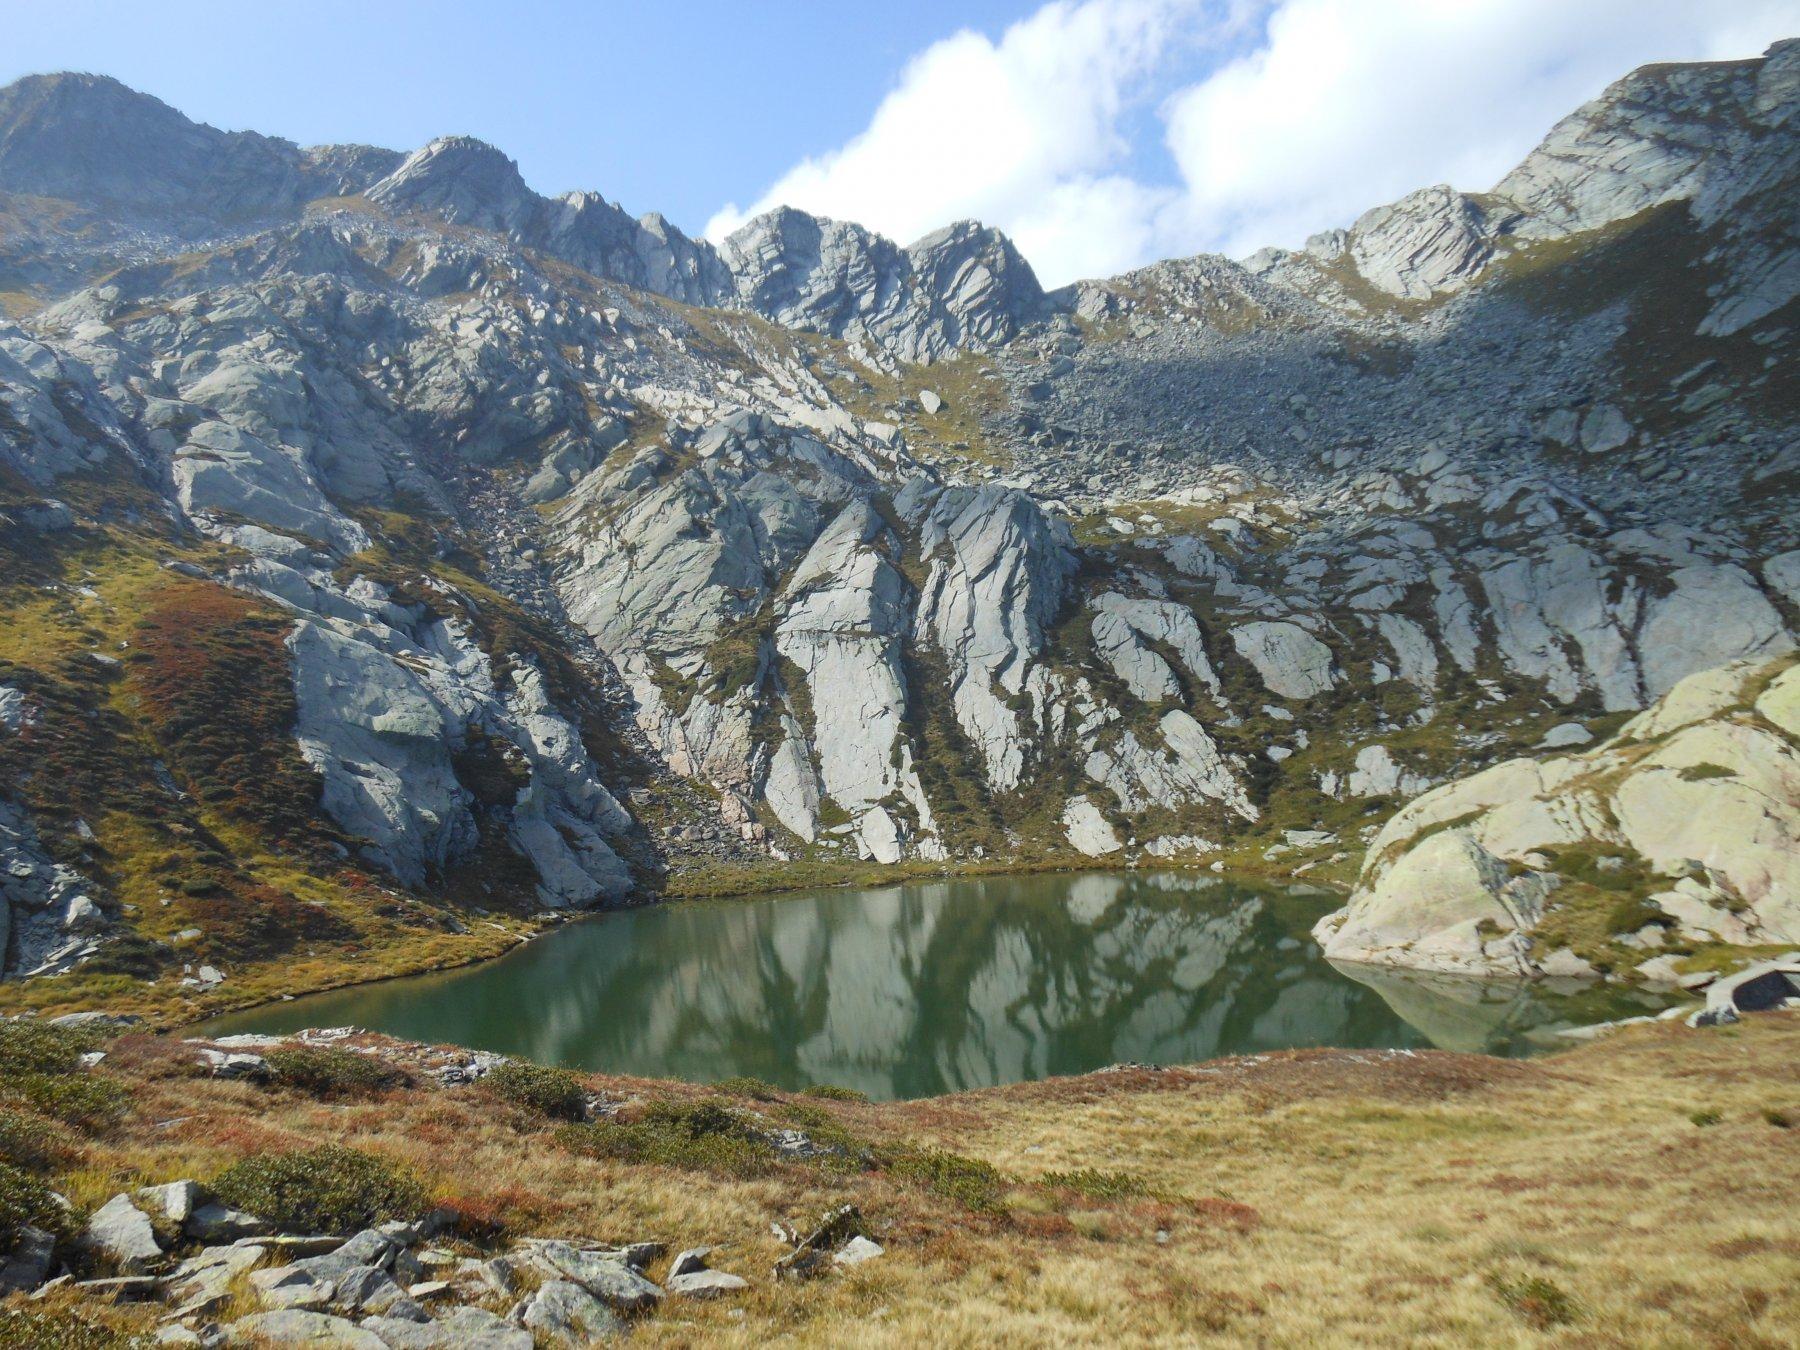 Chenessy lake